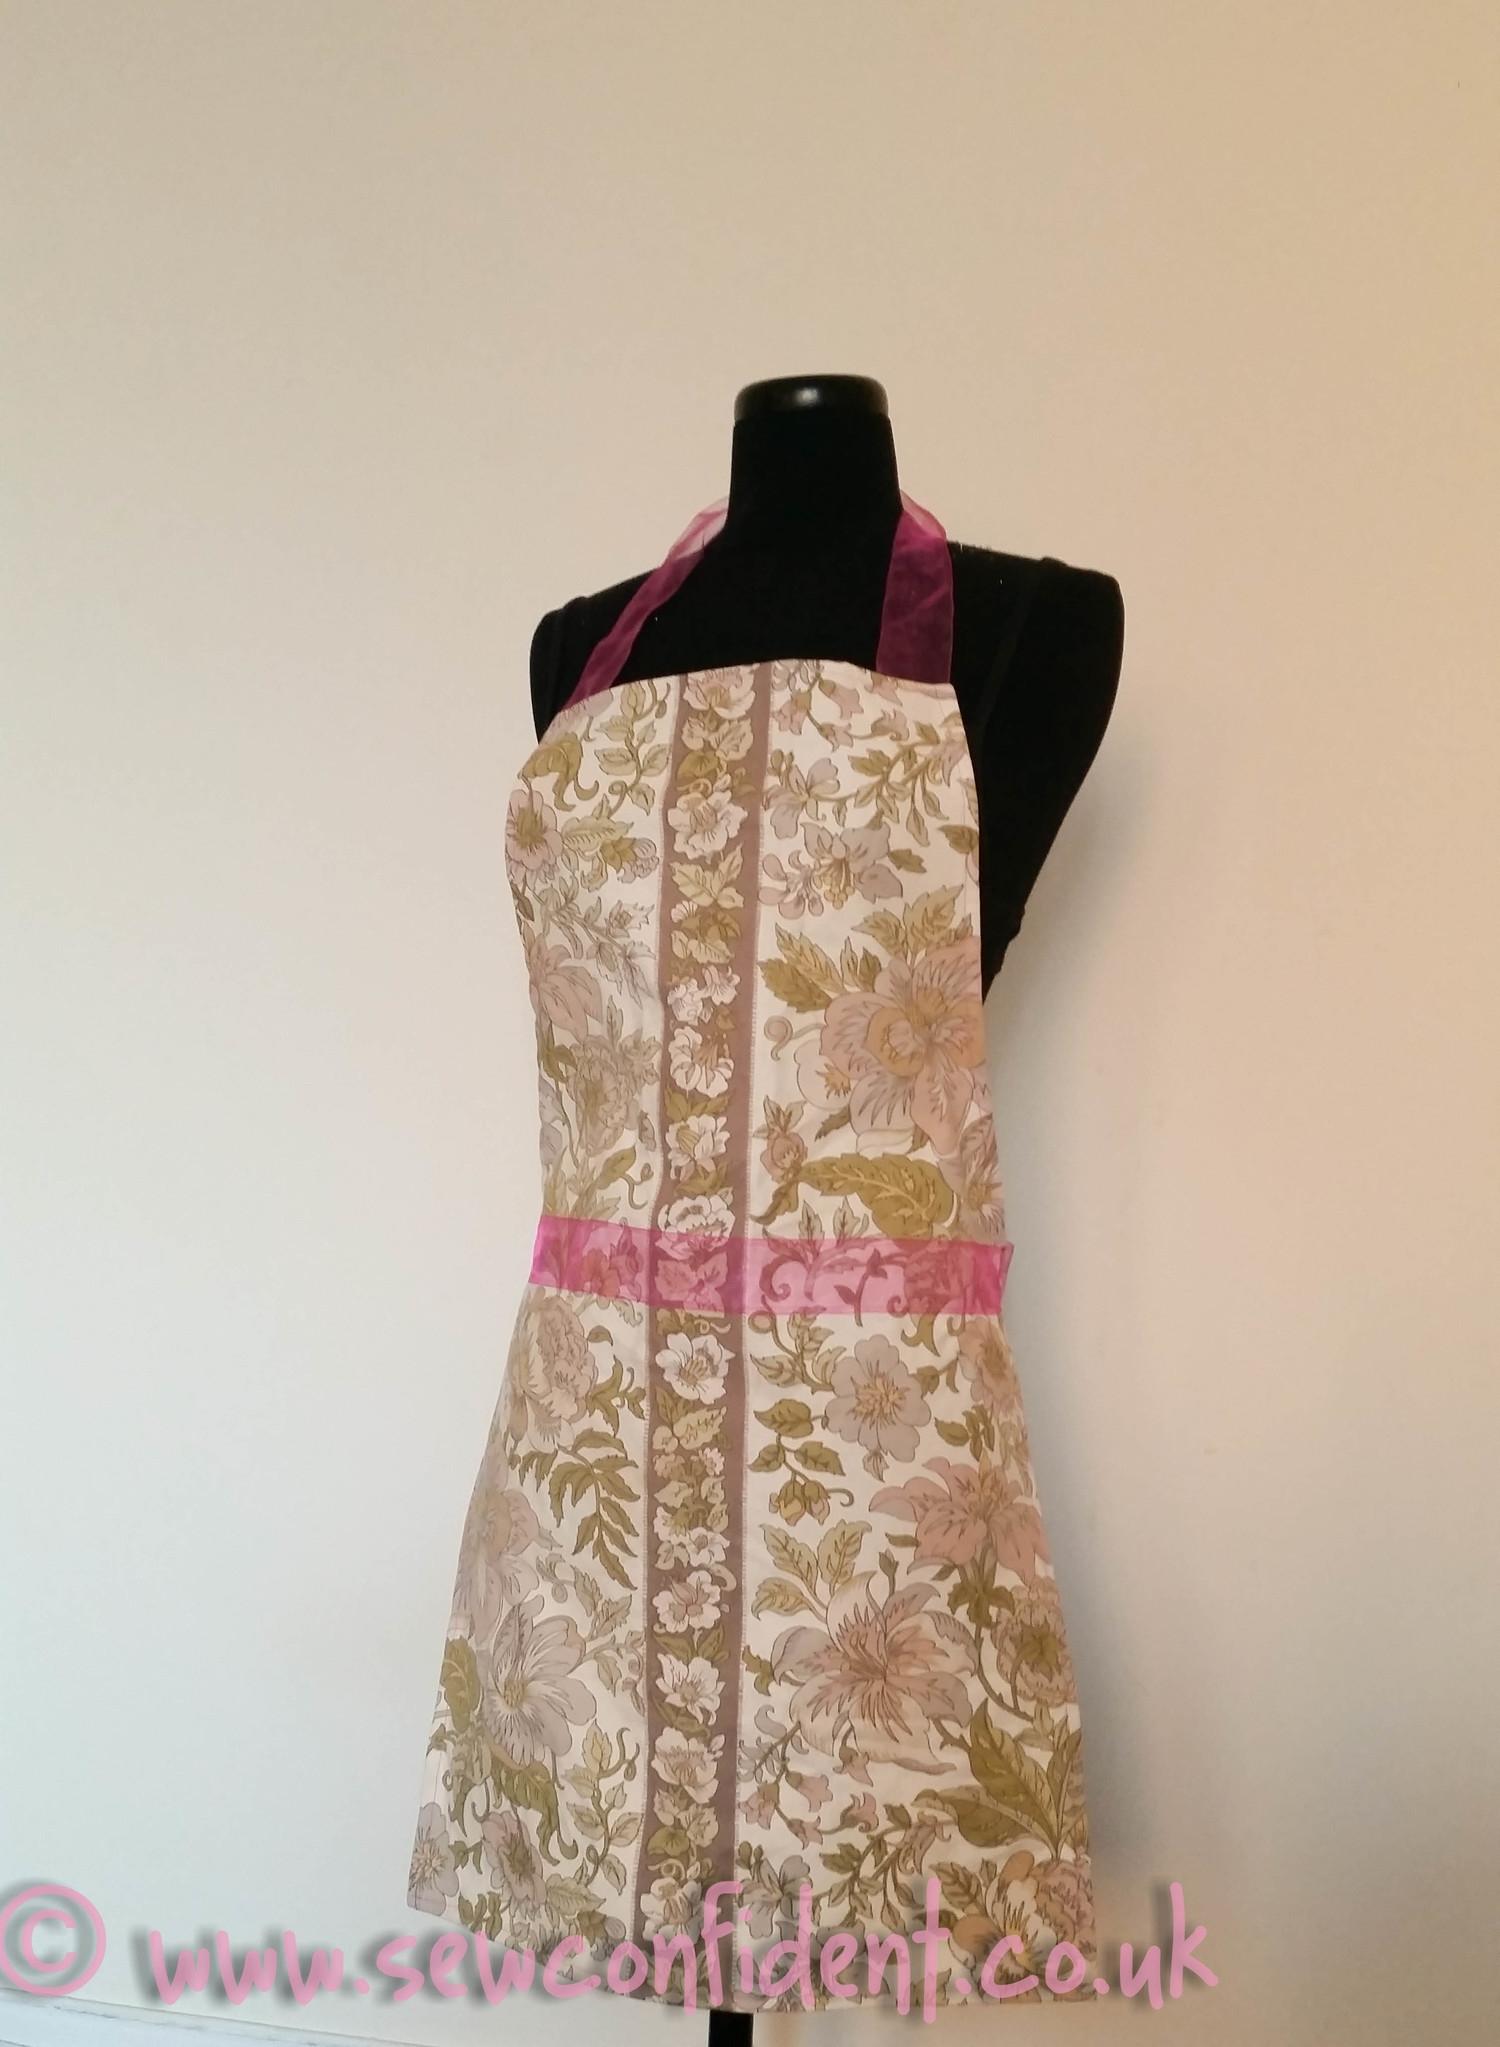 Eco friendly apron